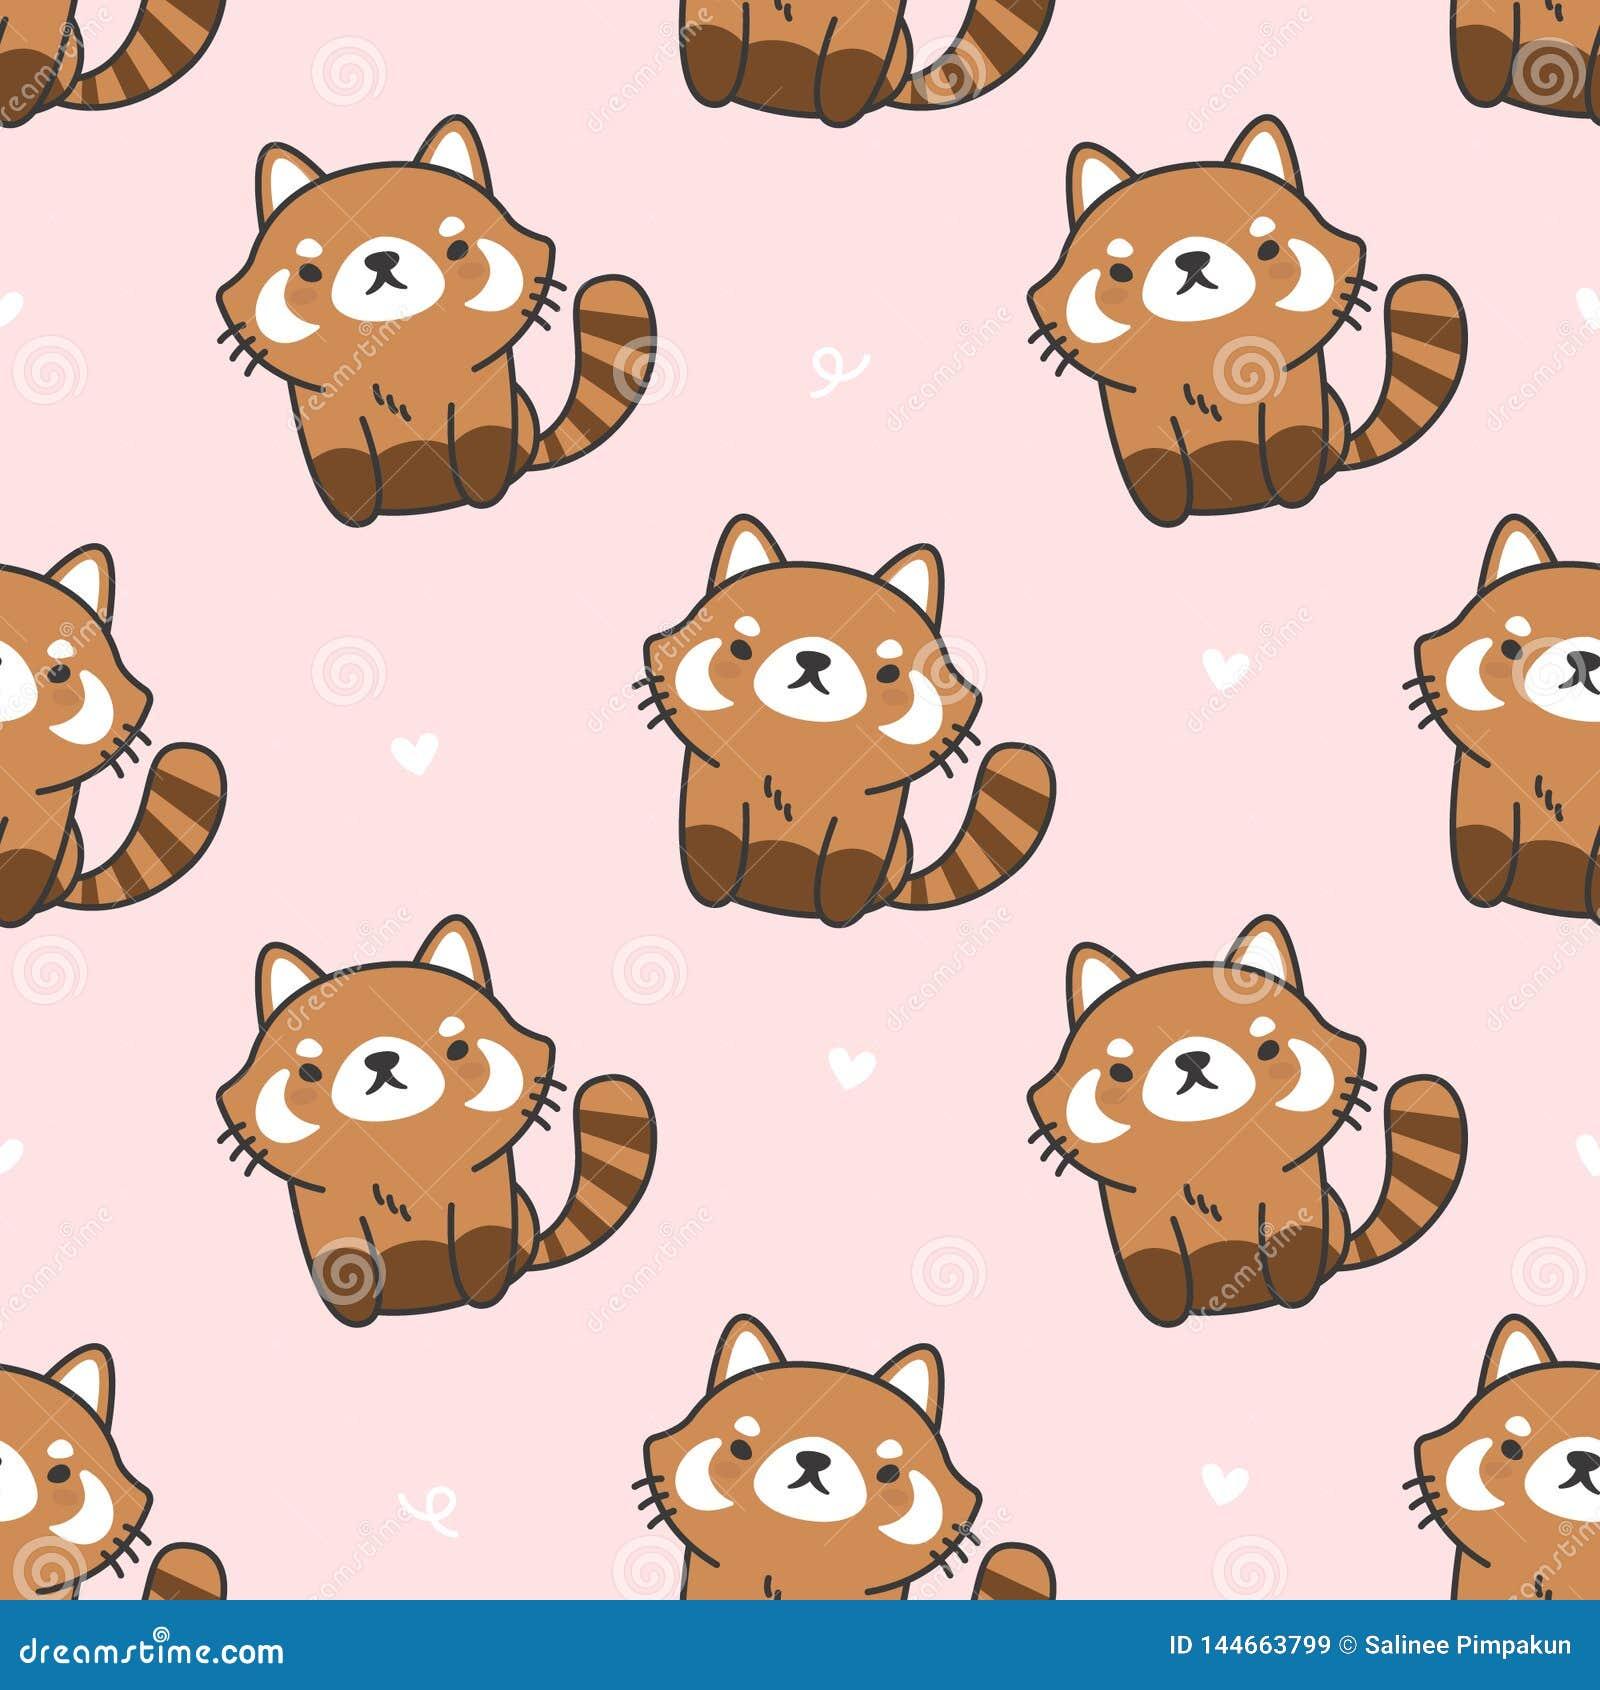 Cute Red Panda Seamless Pattern Background Stock Illustration Illustration Of Backdrop Smile 144663799